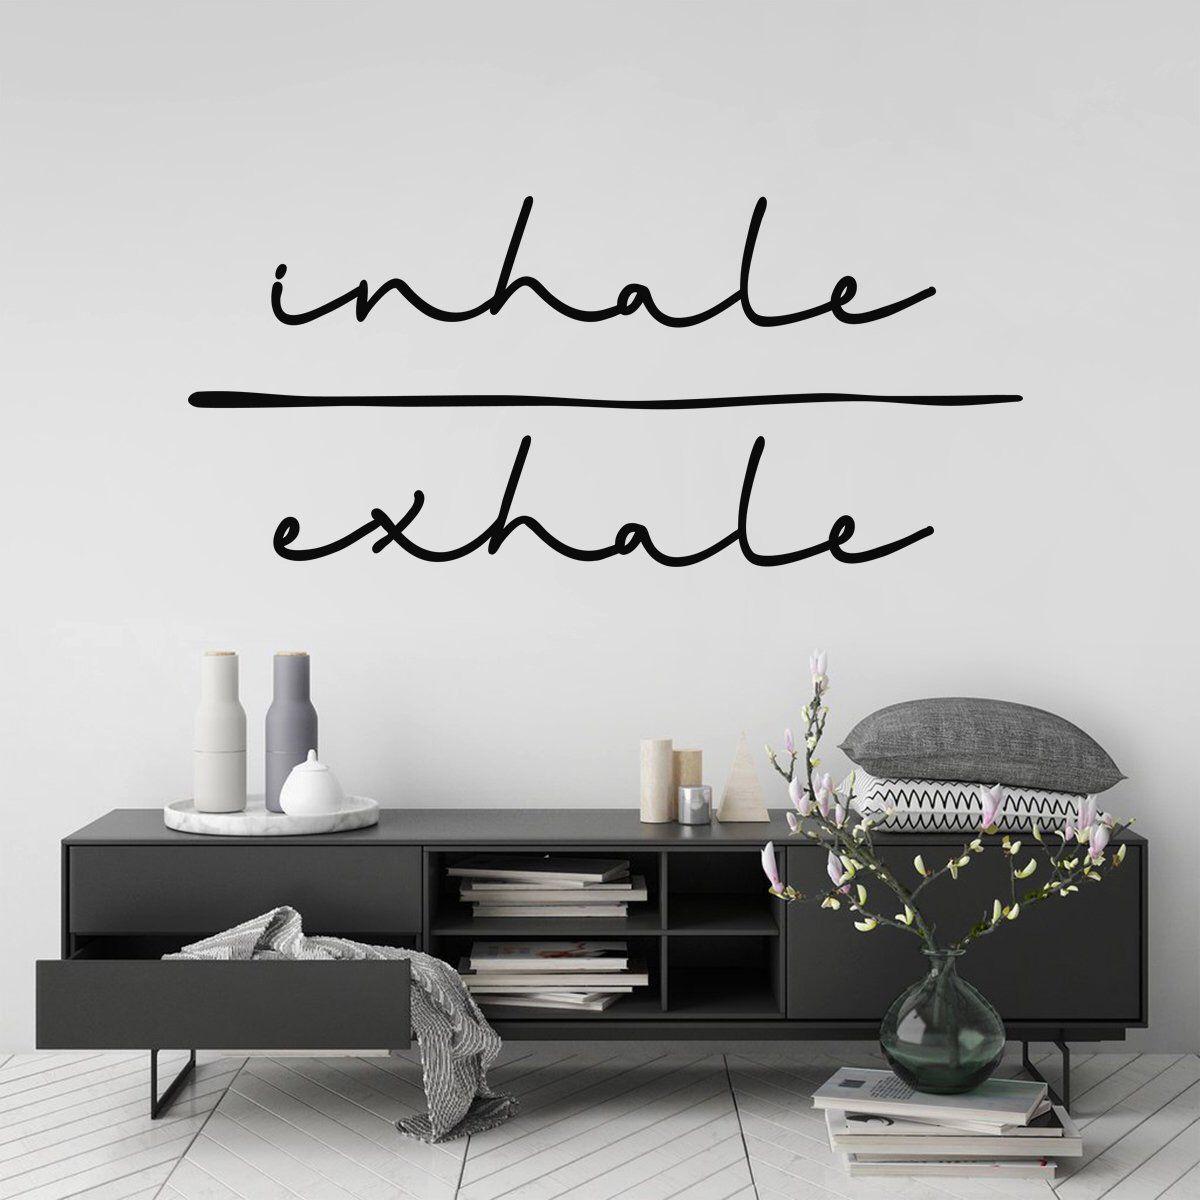 Inhale exhale wall art sticker minimalist room decor